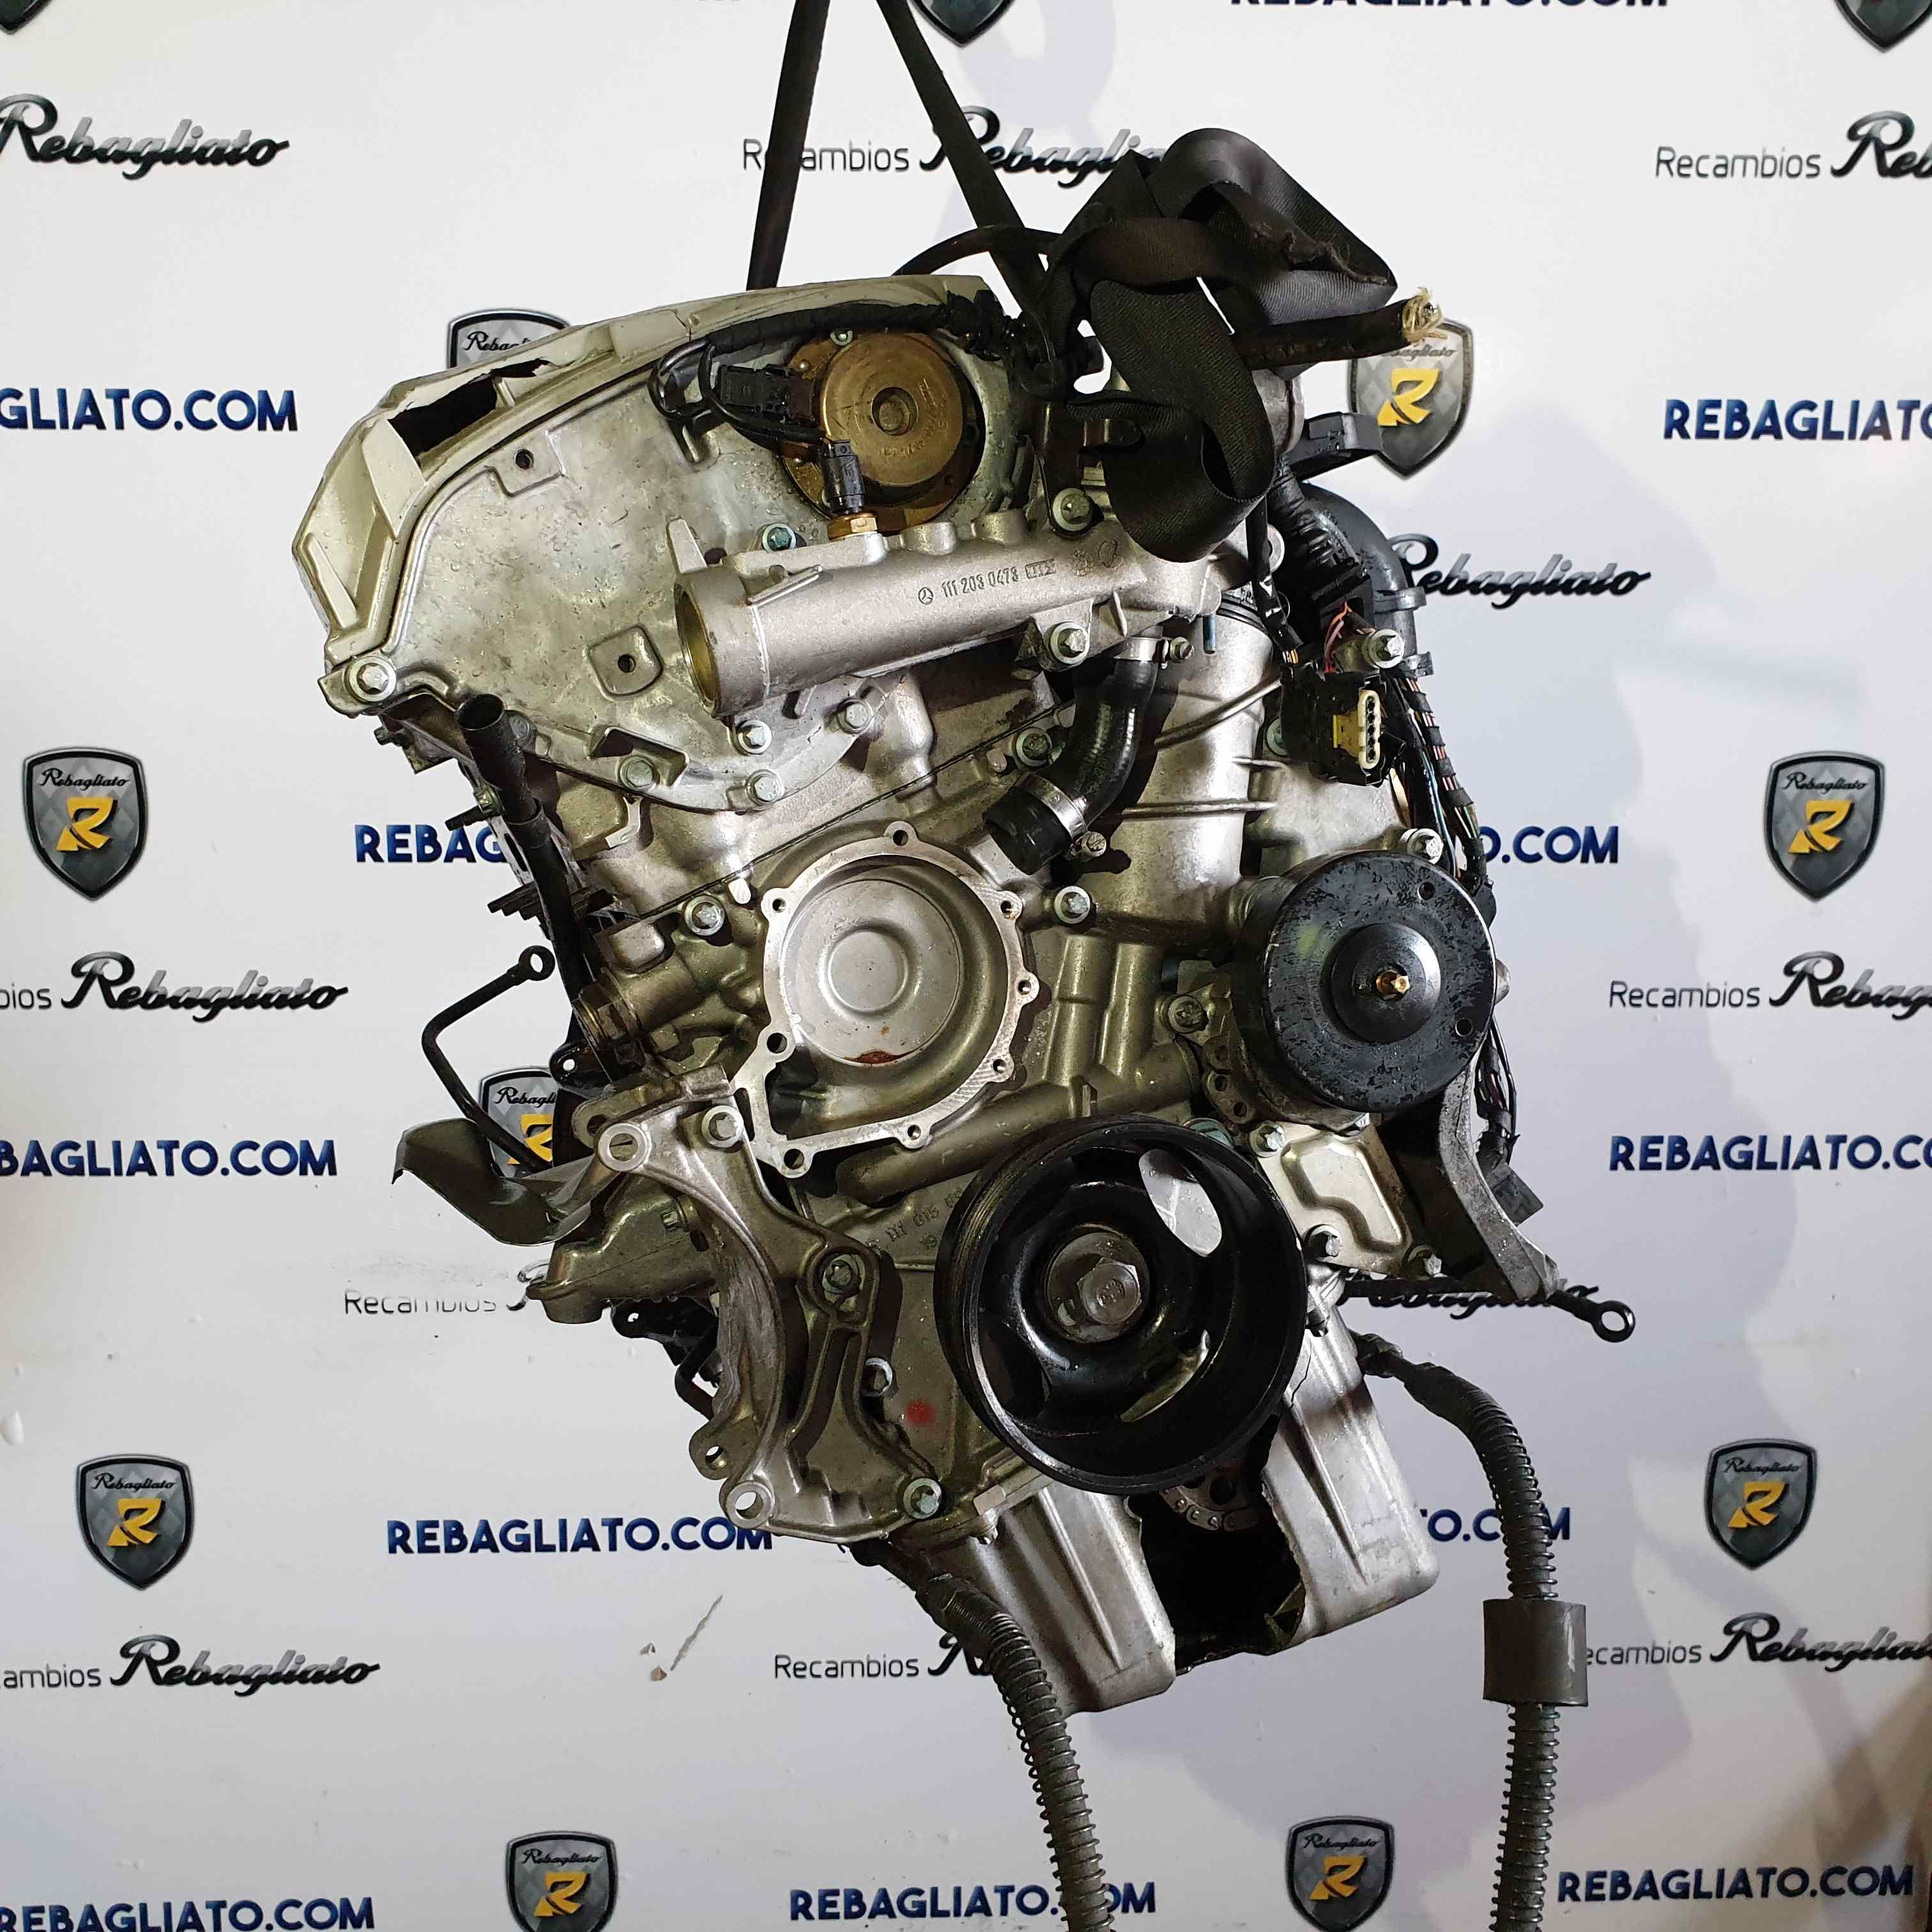 Motor completo de Mercedes Clase e (w210) berlina (1995 - 2002) 2036